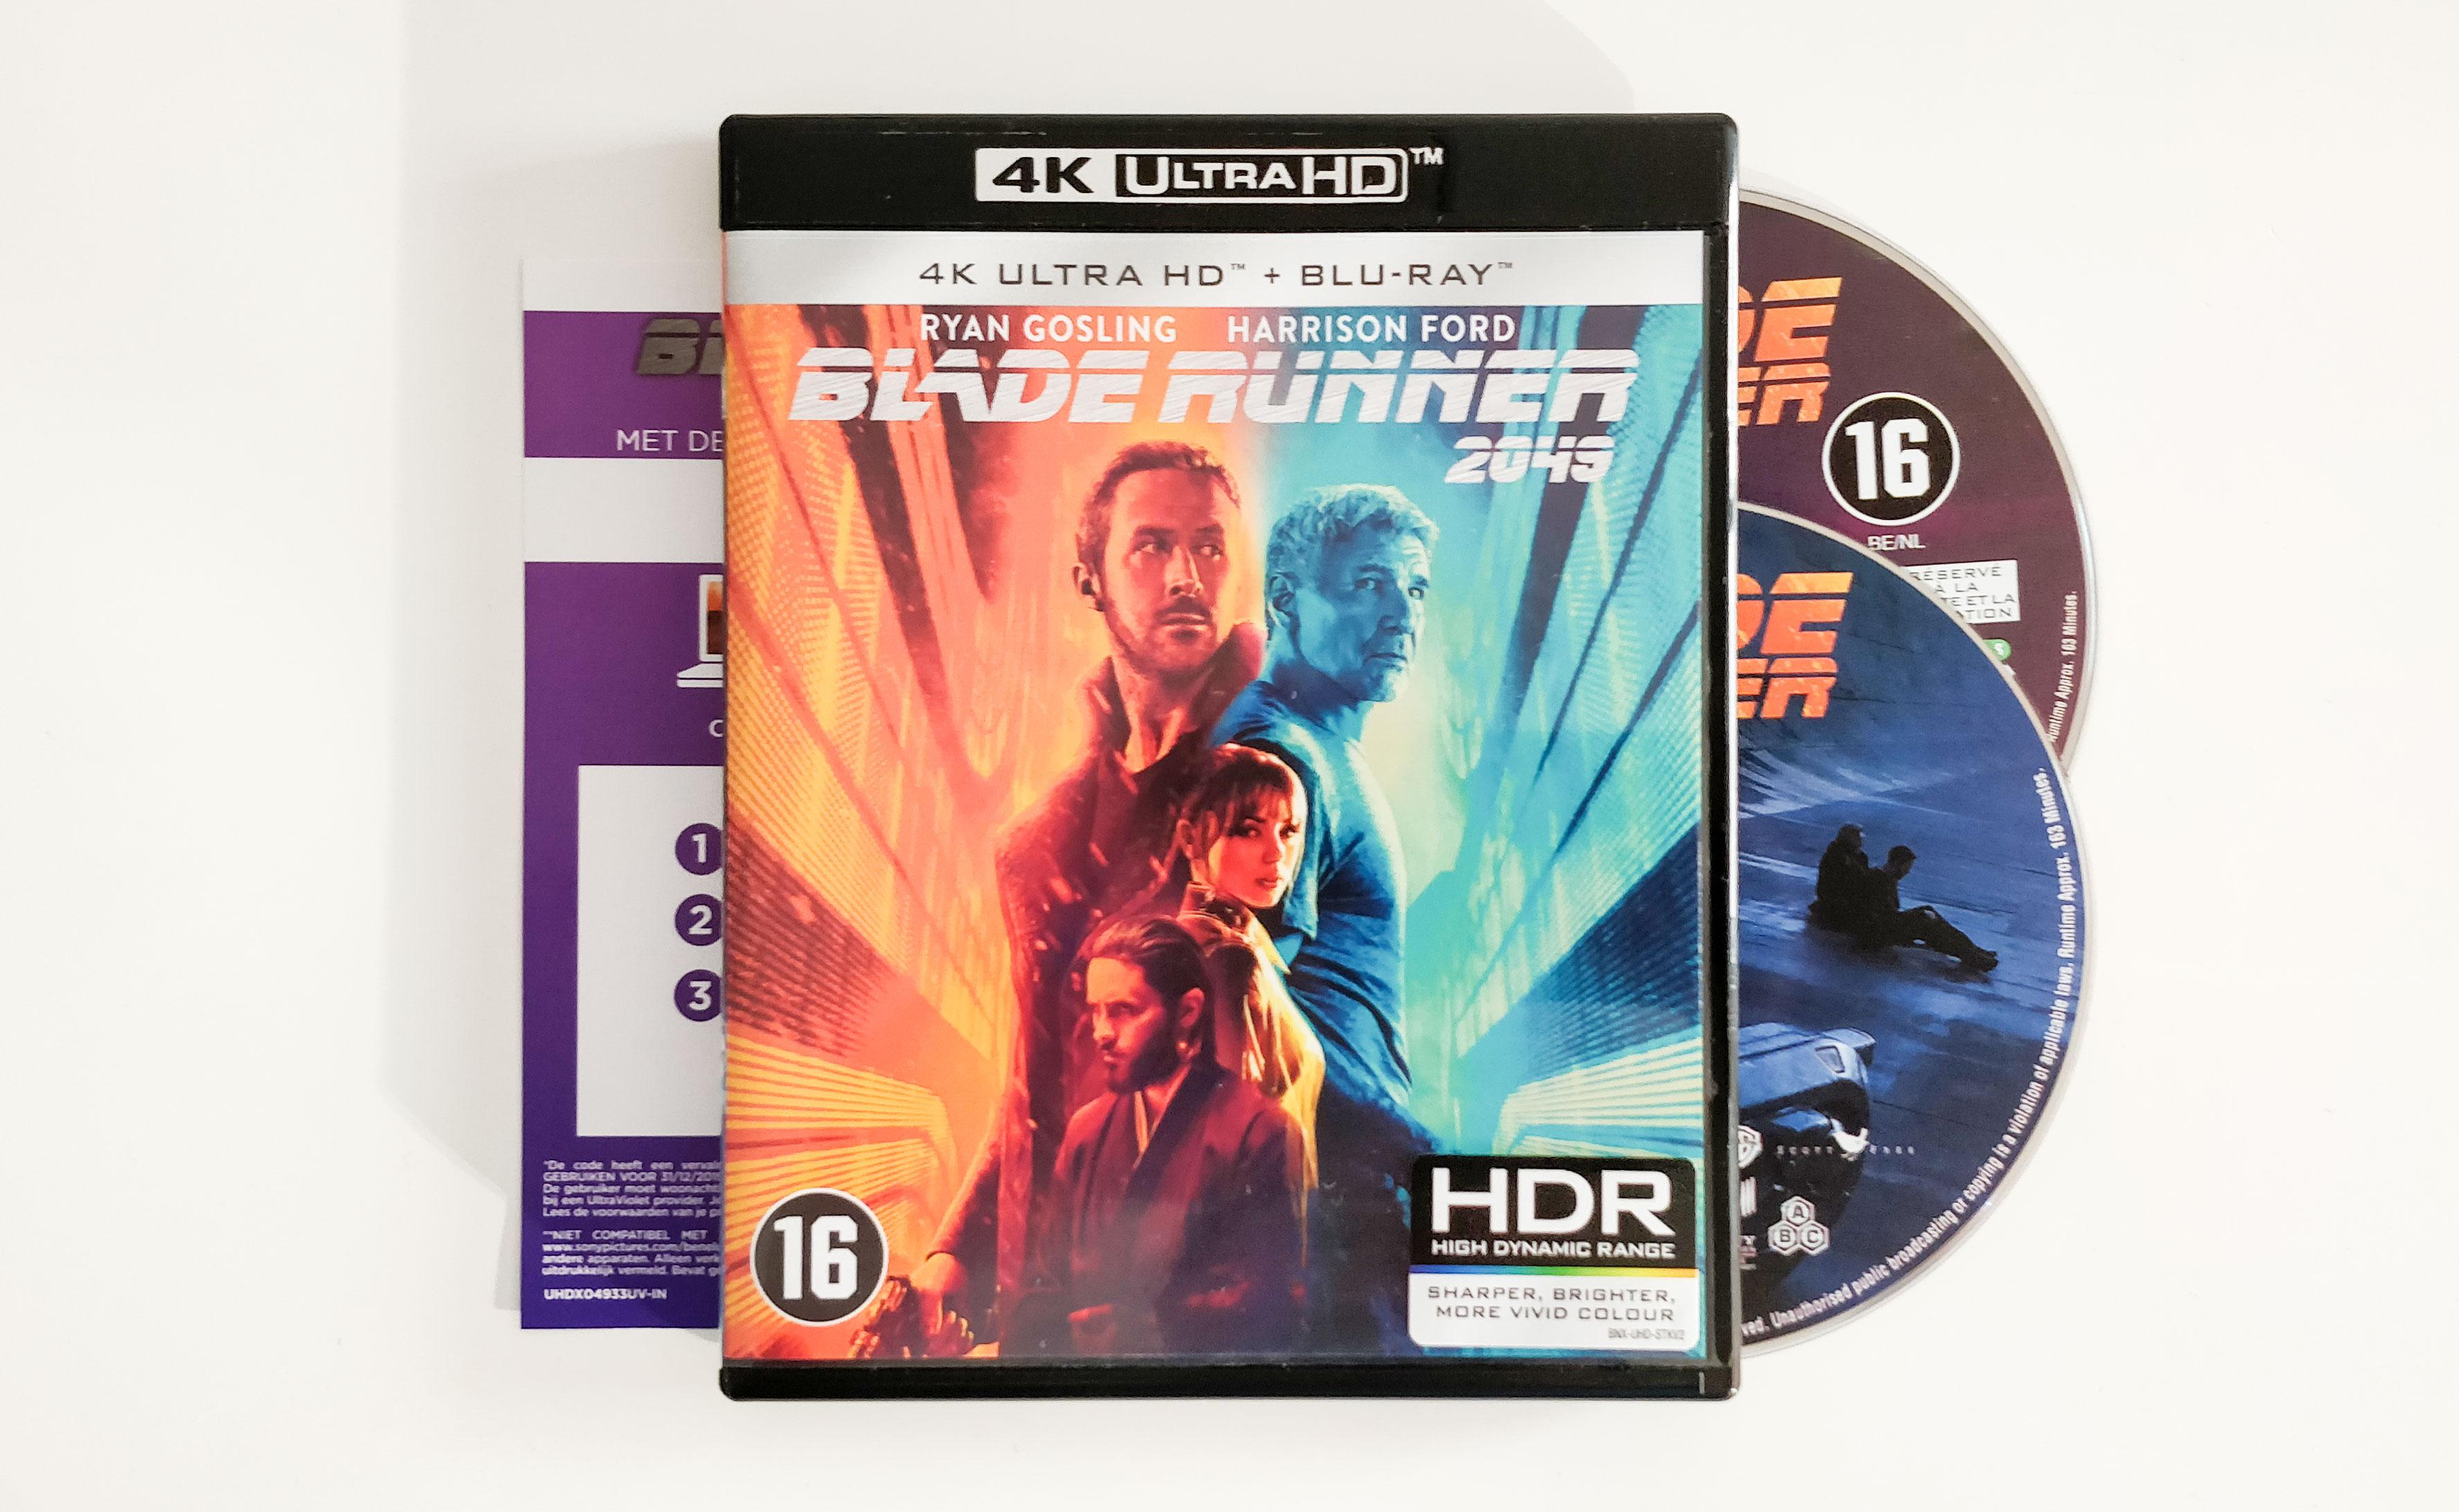 blade runner 2049 4k blu ray review